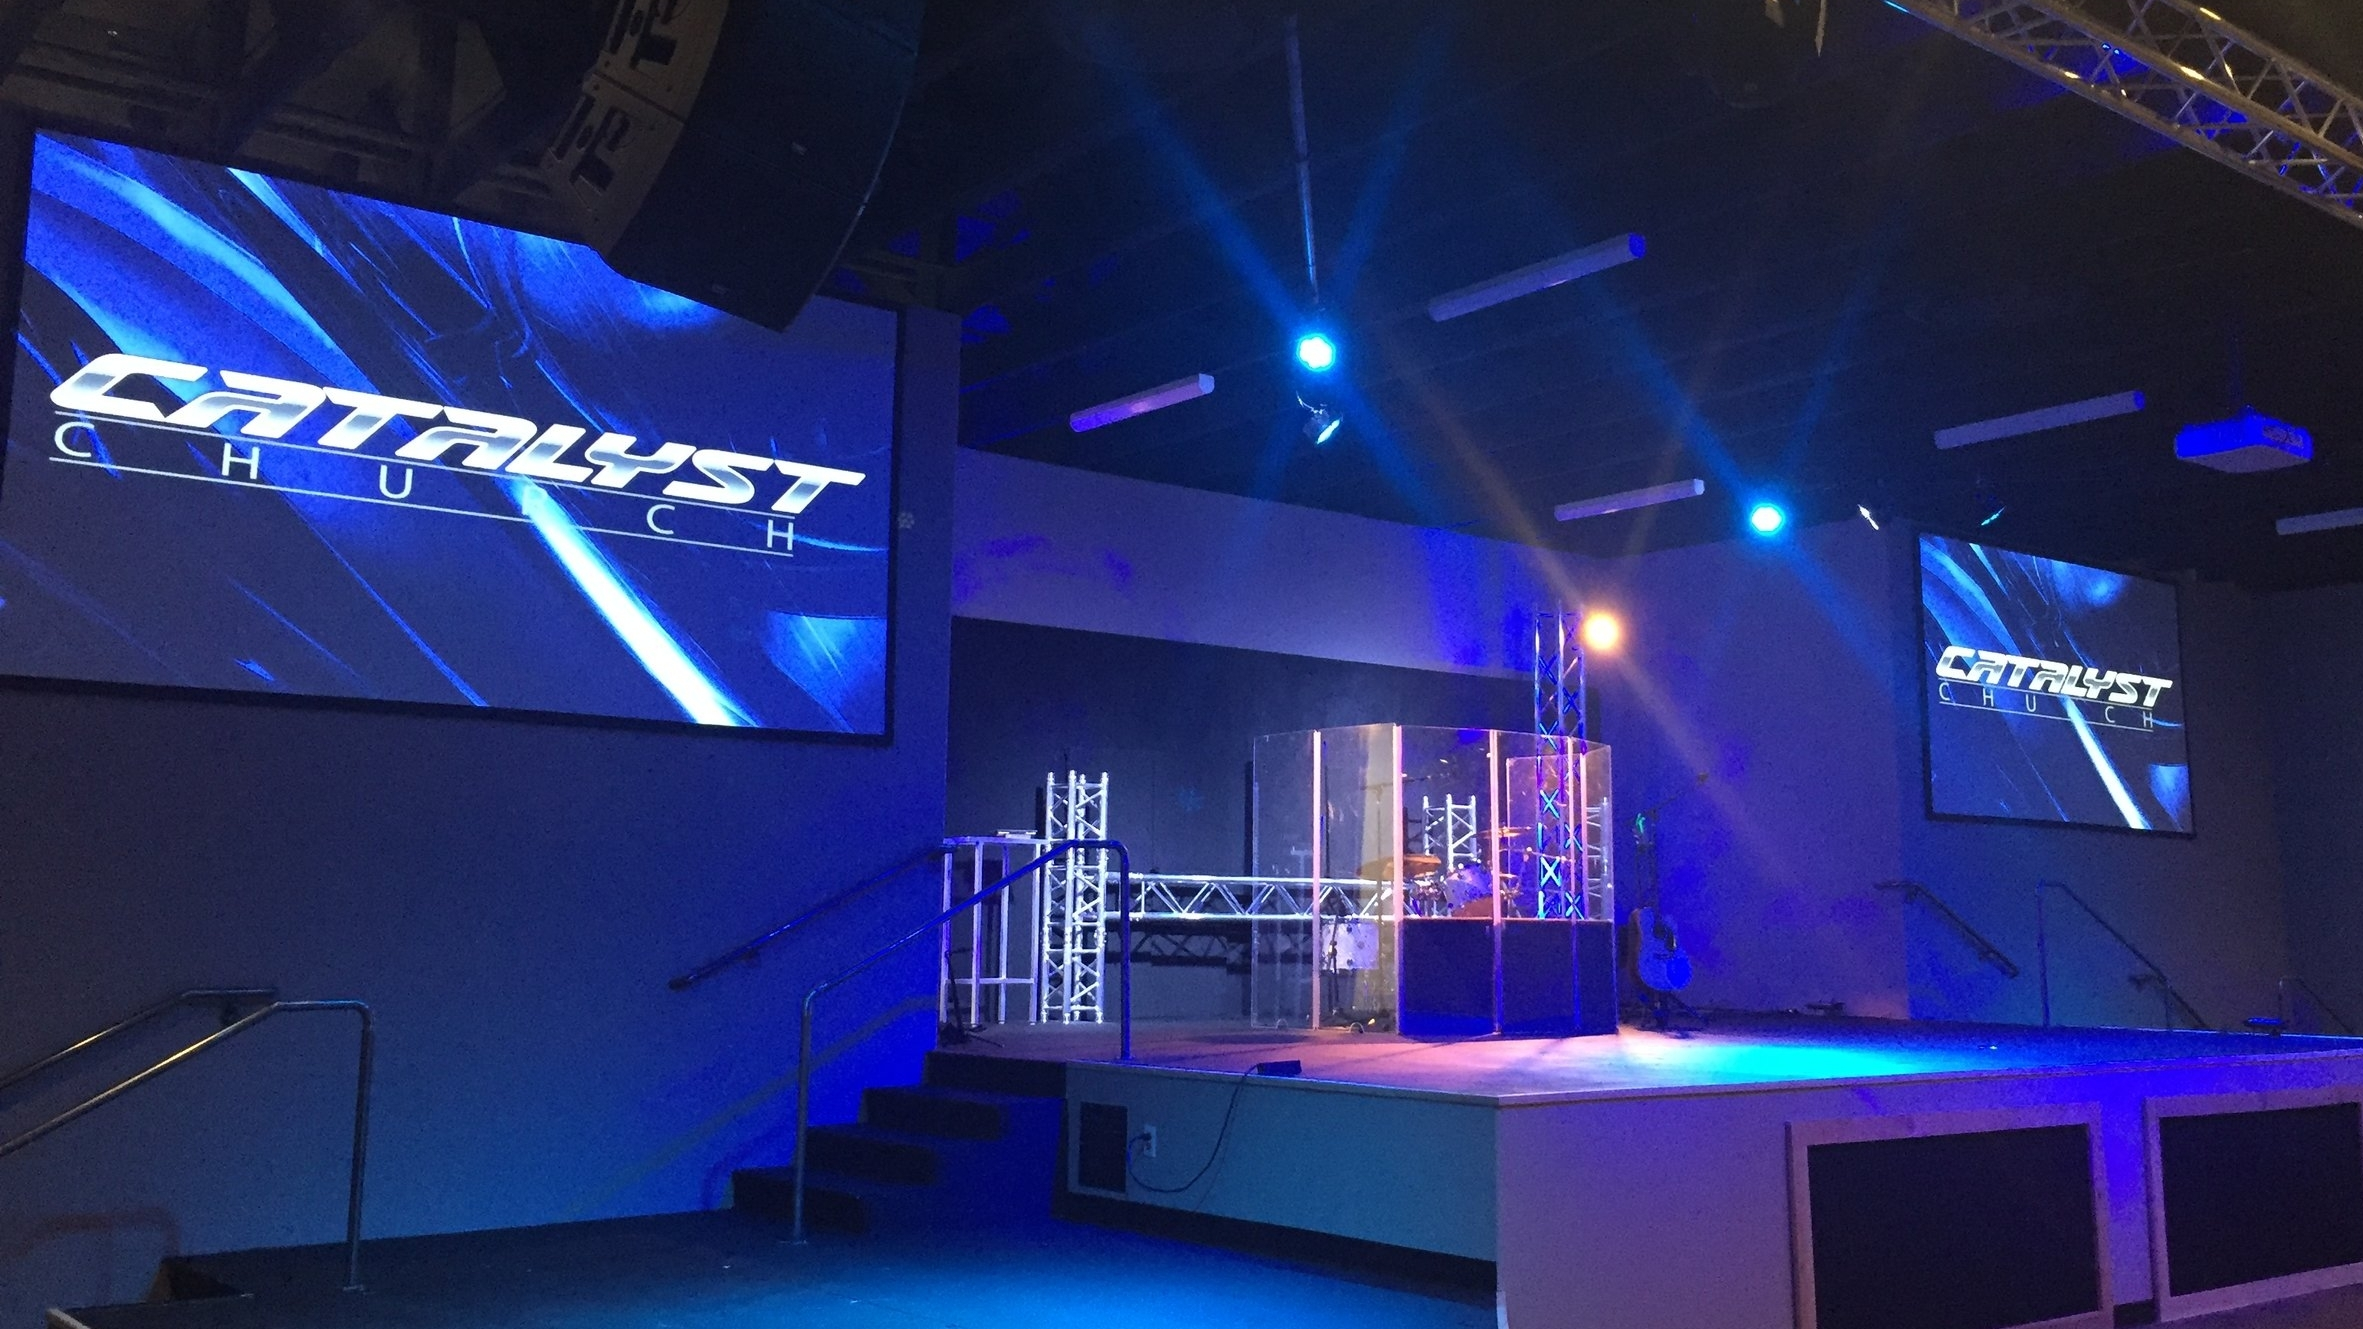 Catalyst Church - Glendale, AZ       (NEC Laser Projectors, QSC Line Array Speaker Systems, Allen & Heath GLD112 Console, BMD ATEM 1M/E Switcher, Studio Camera 4K, Studio Micro Camera 4K)